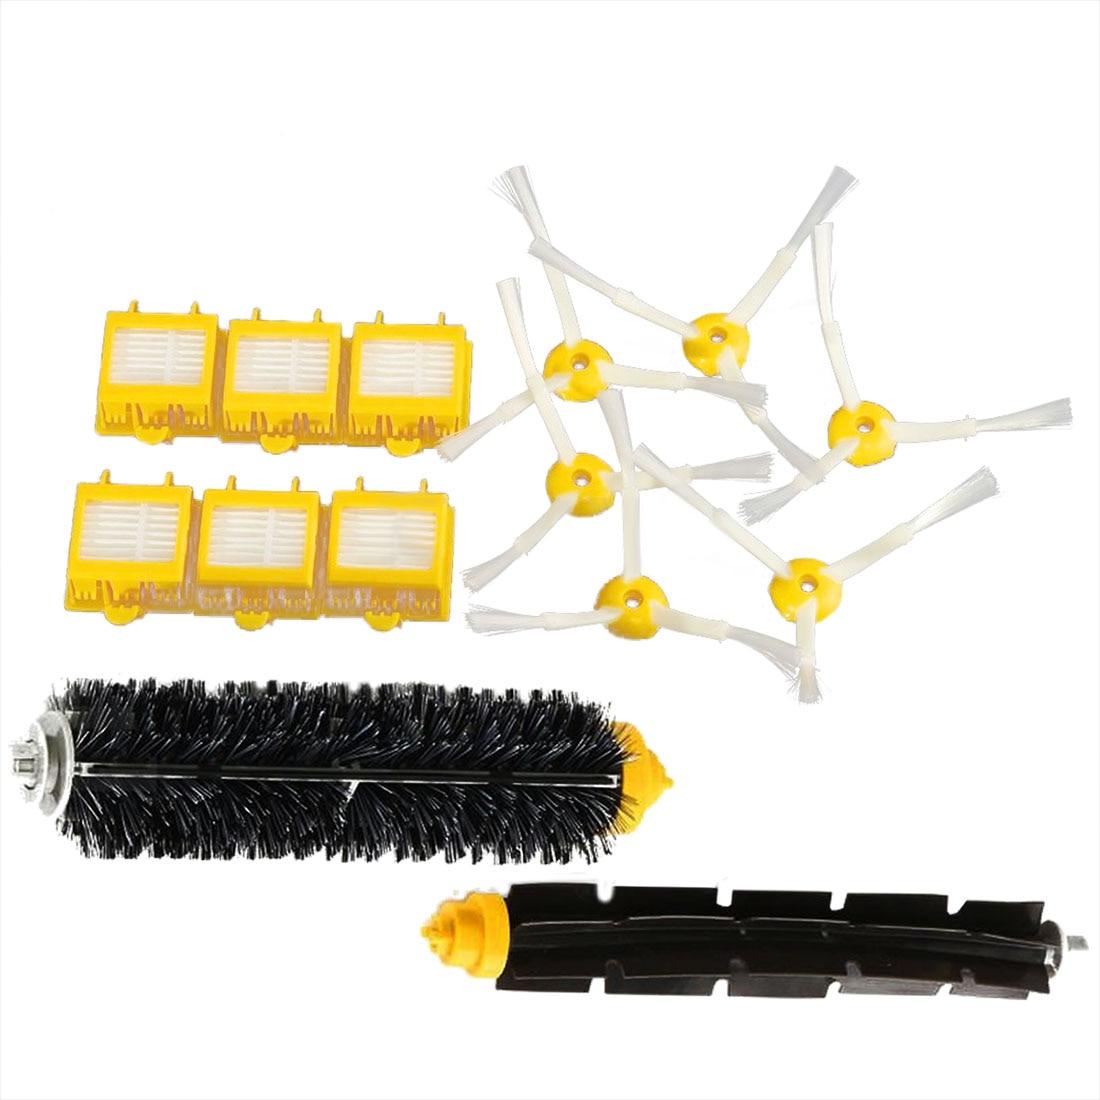 hair brush Filter Kit for iRobot Roomba 700/760/770/780 bristle brush flexible beater brush fit for irobot roomba 500 600 700 series 550 650 660 760 770 780 790 vacuum cleaner parts